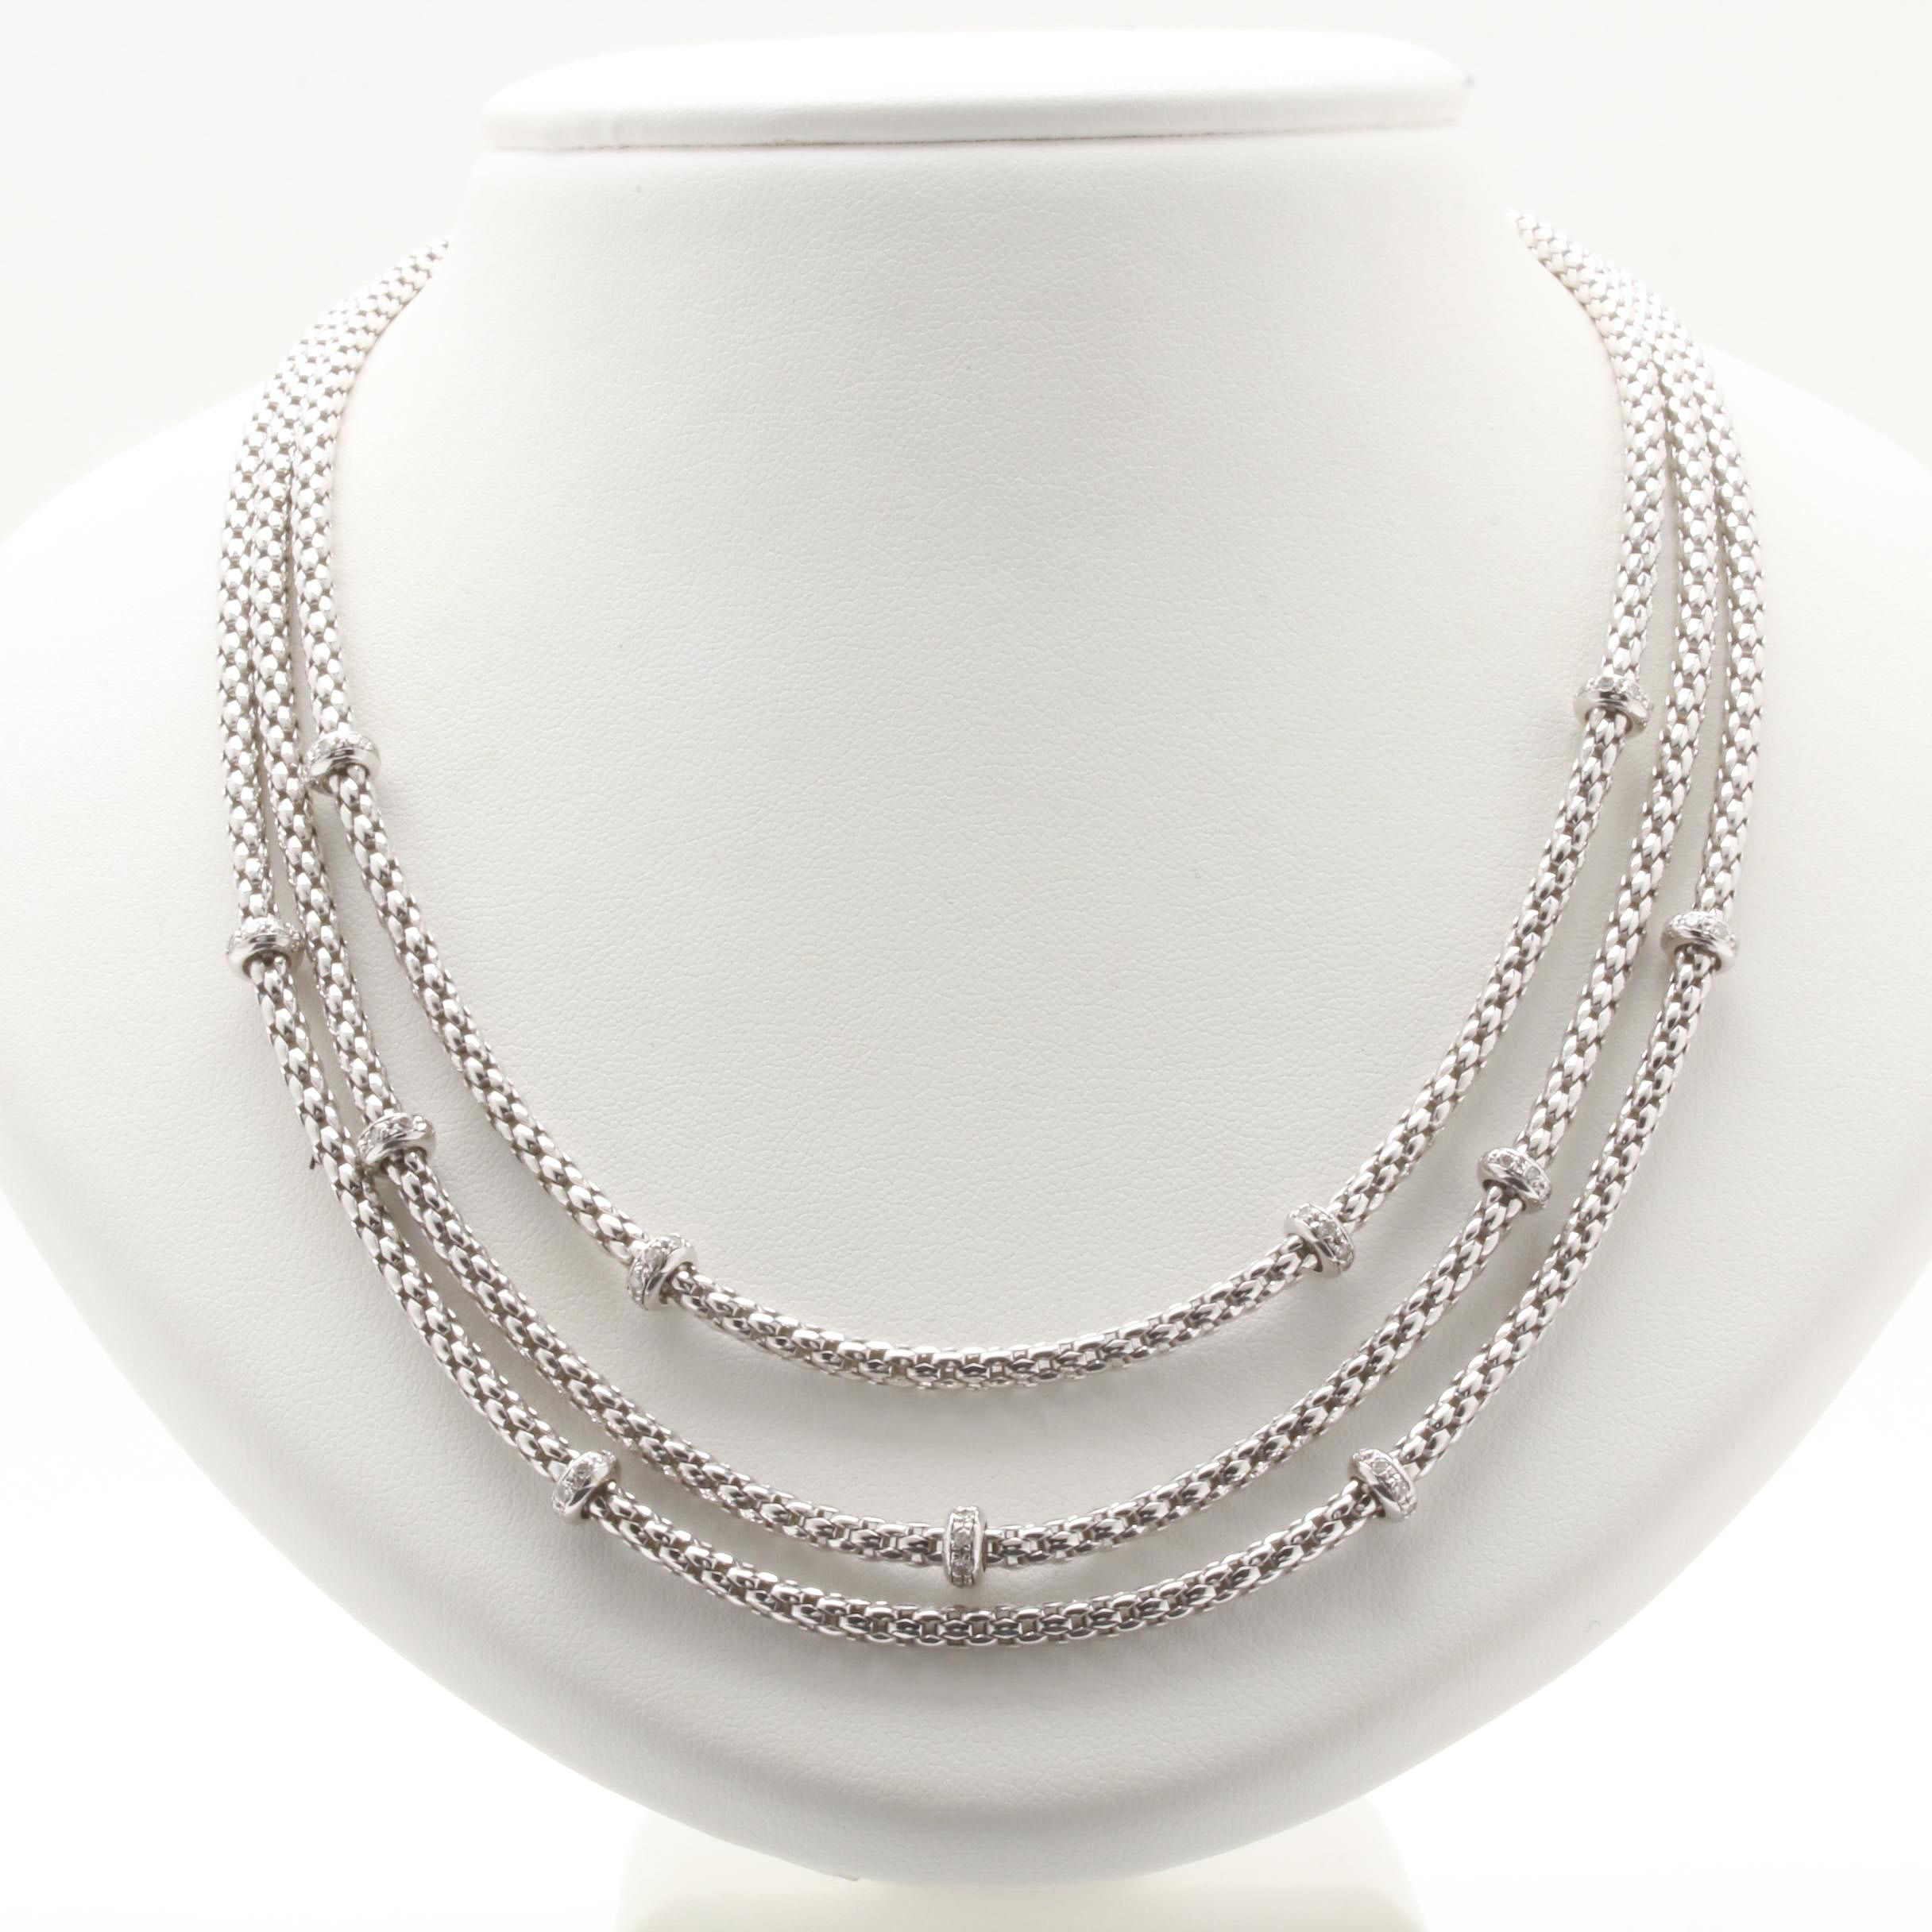 Fope 18K White Gold 1.10 CTW Diamond Three Strand Necklace